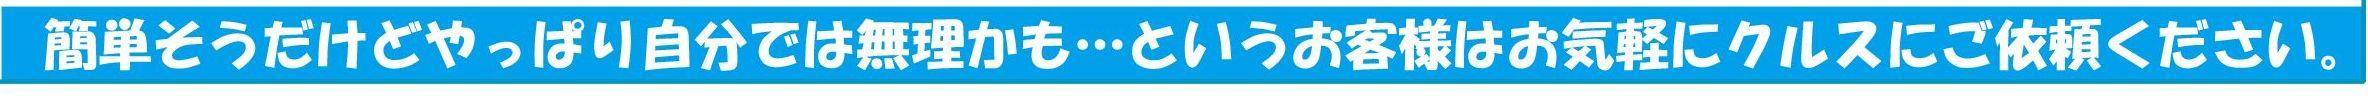 KuraSi-natu-sin101-0805.jpg